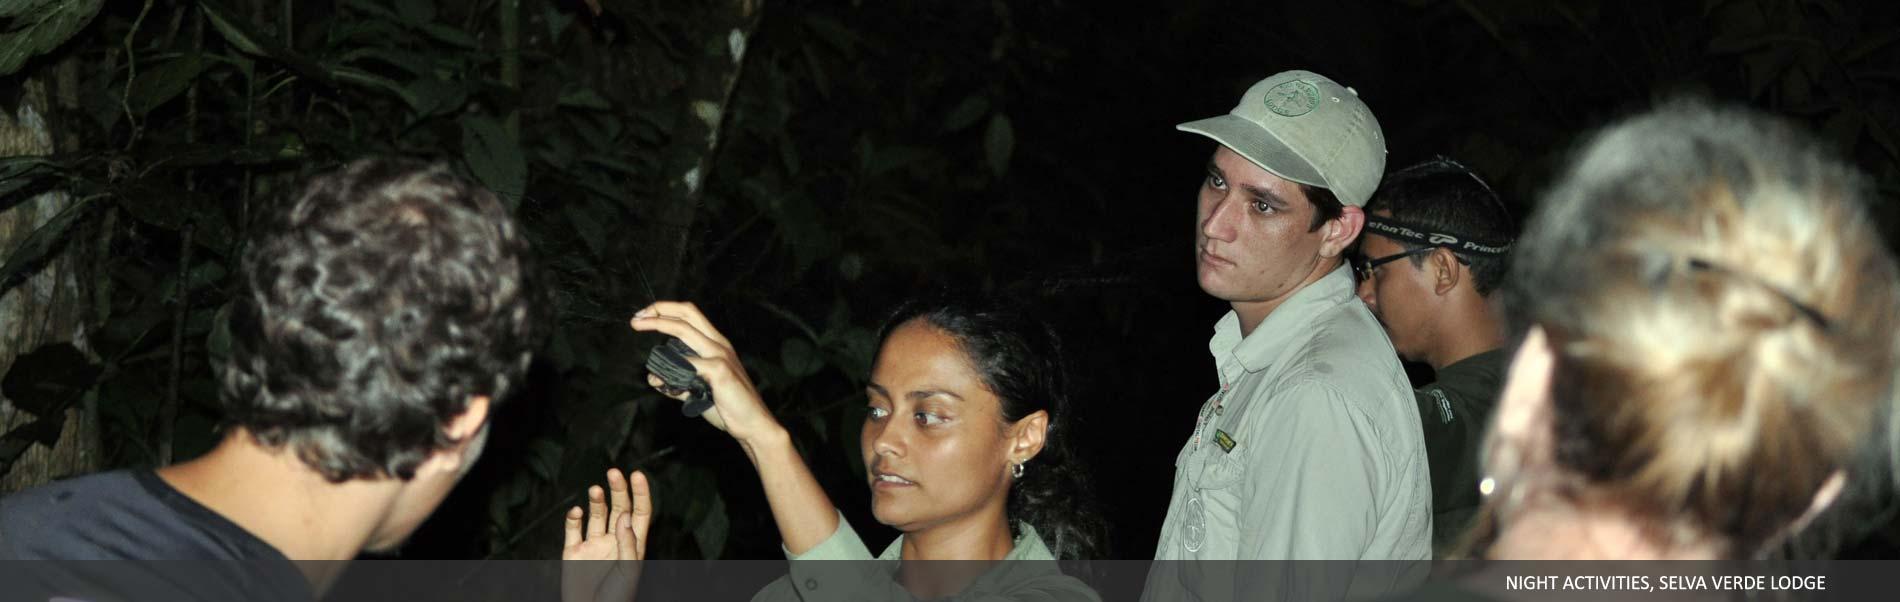 selvaverde-costarica-20.jpg